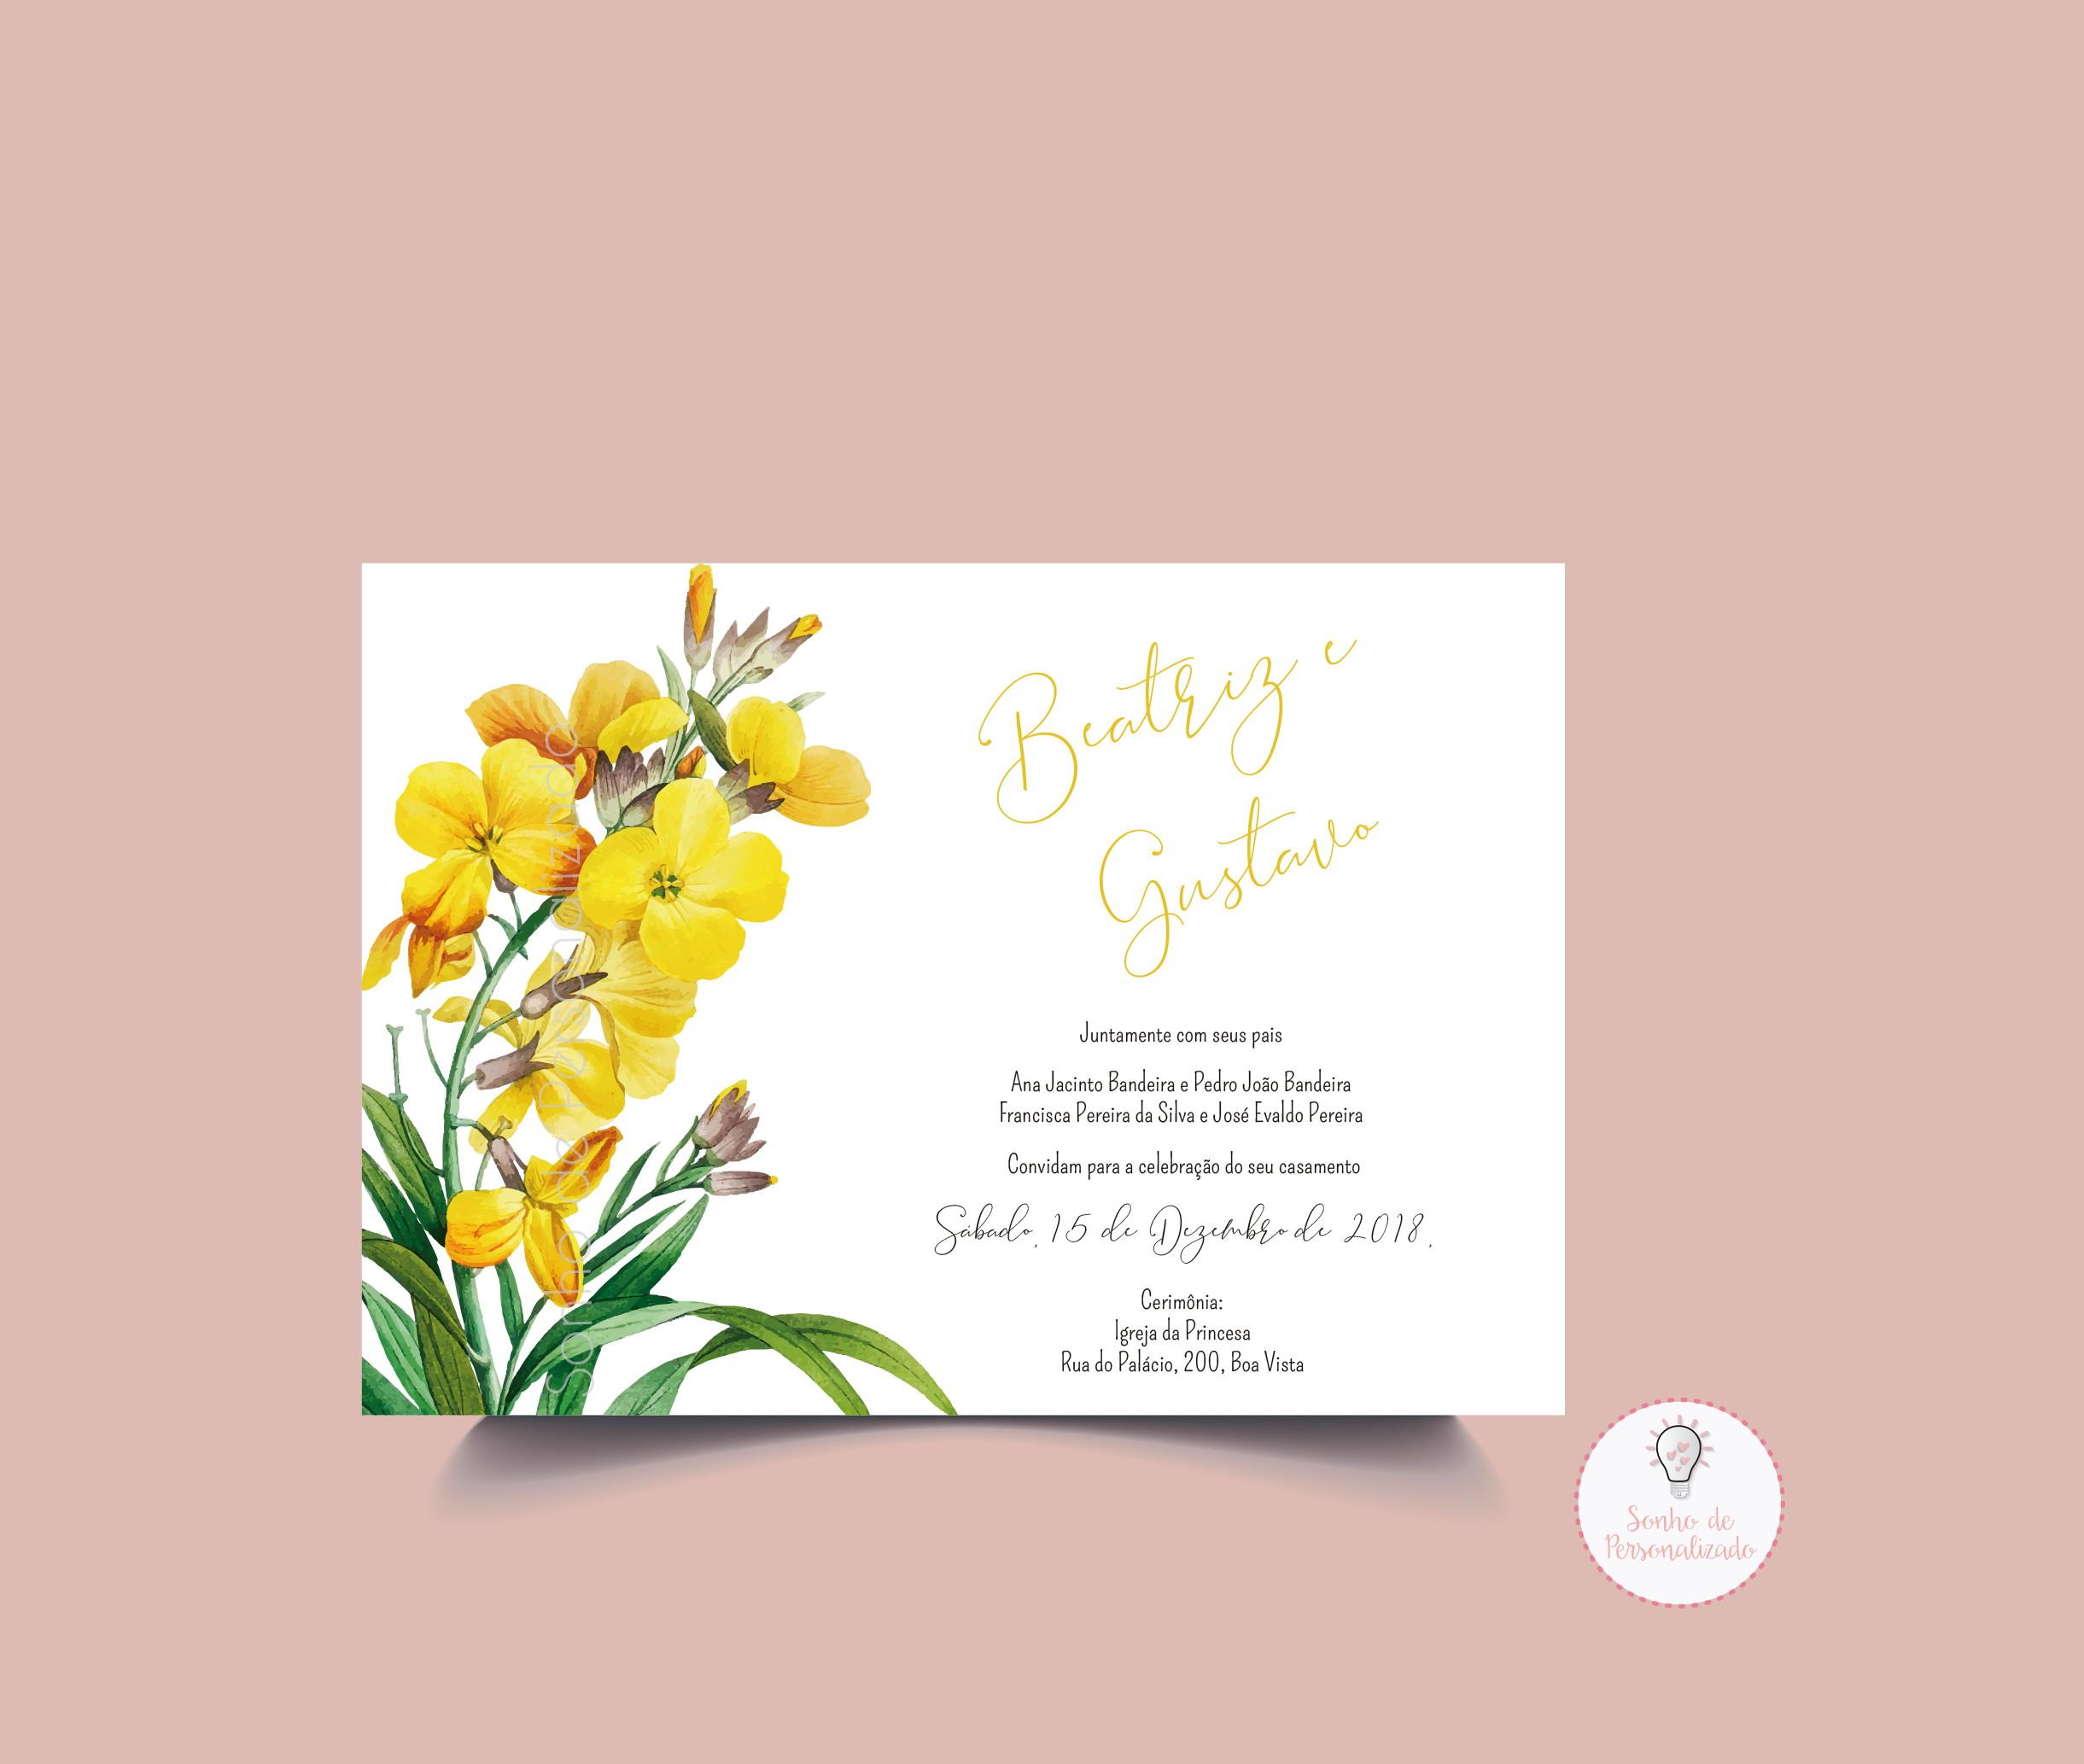 Convite De Casamento Amarelo Elo7